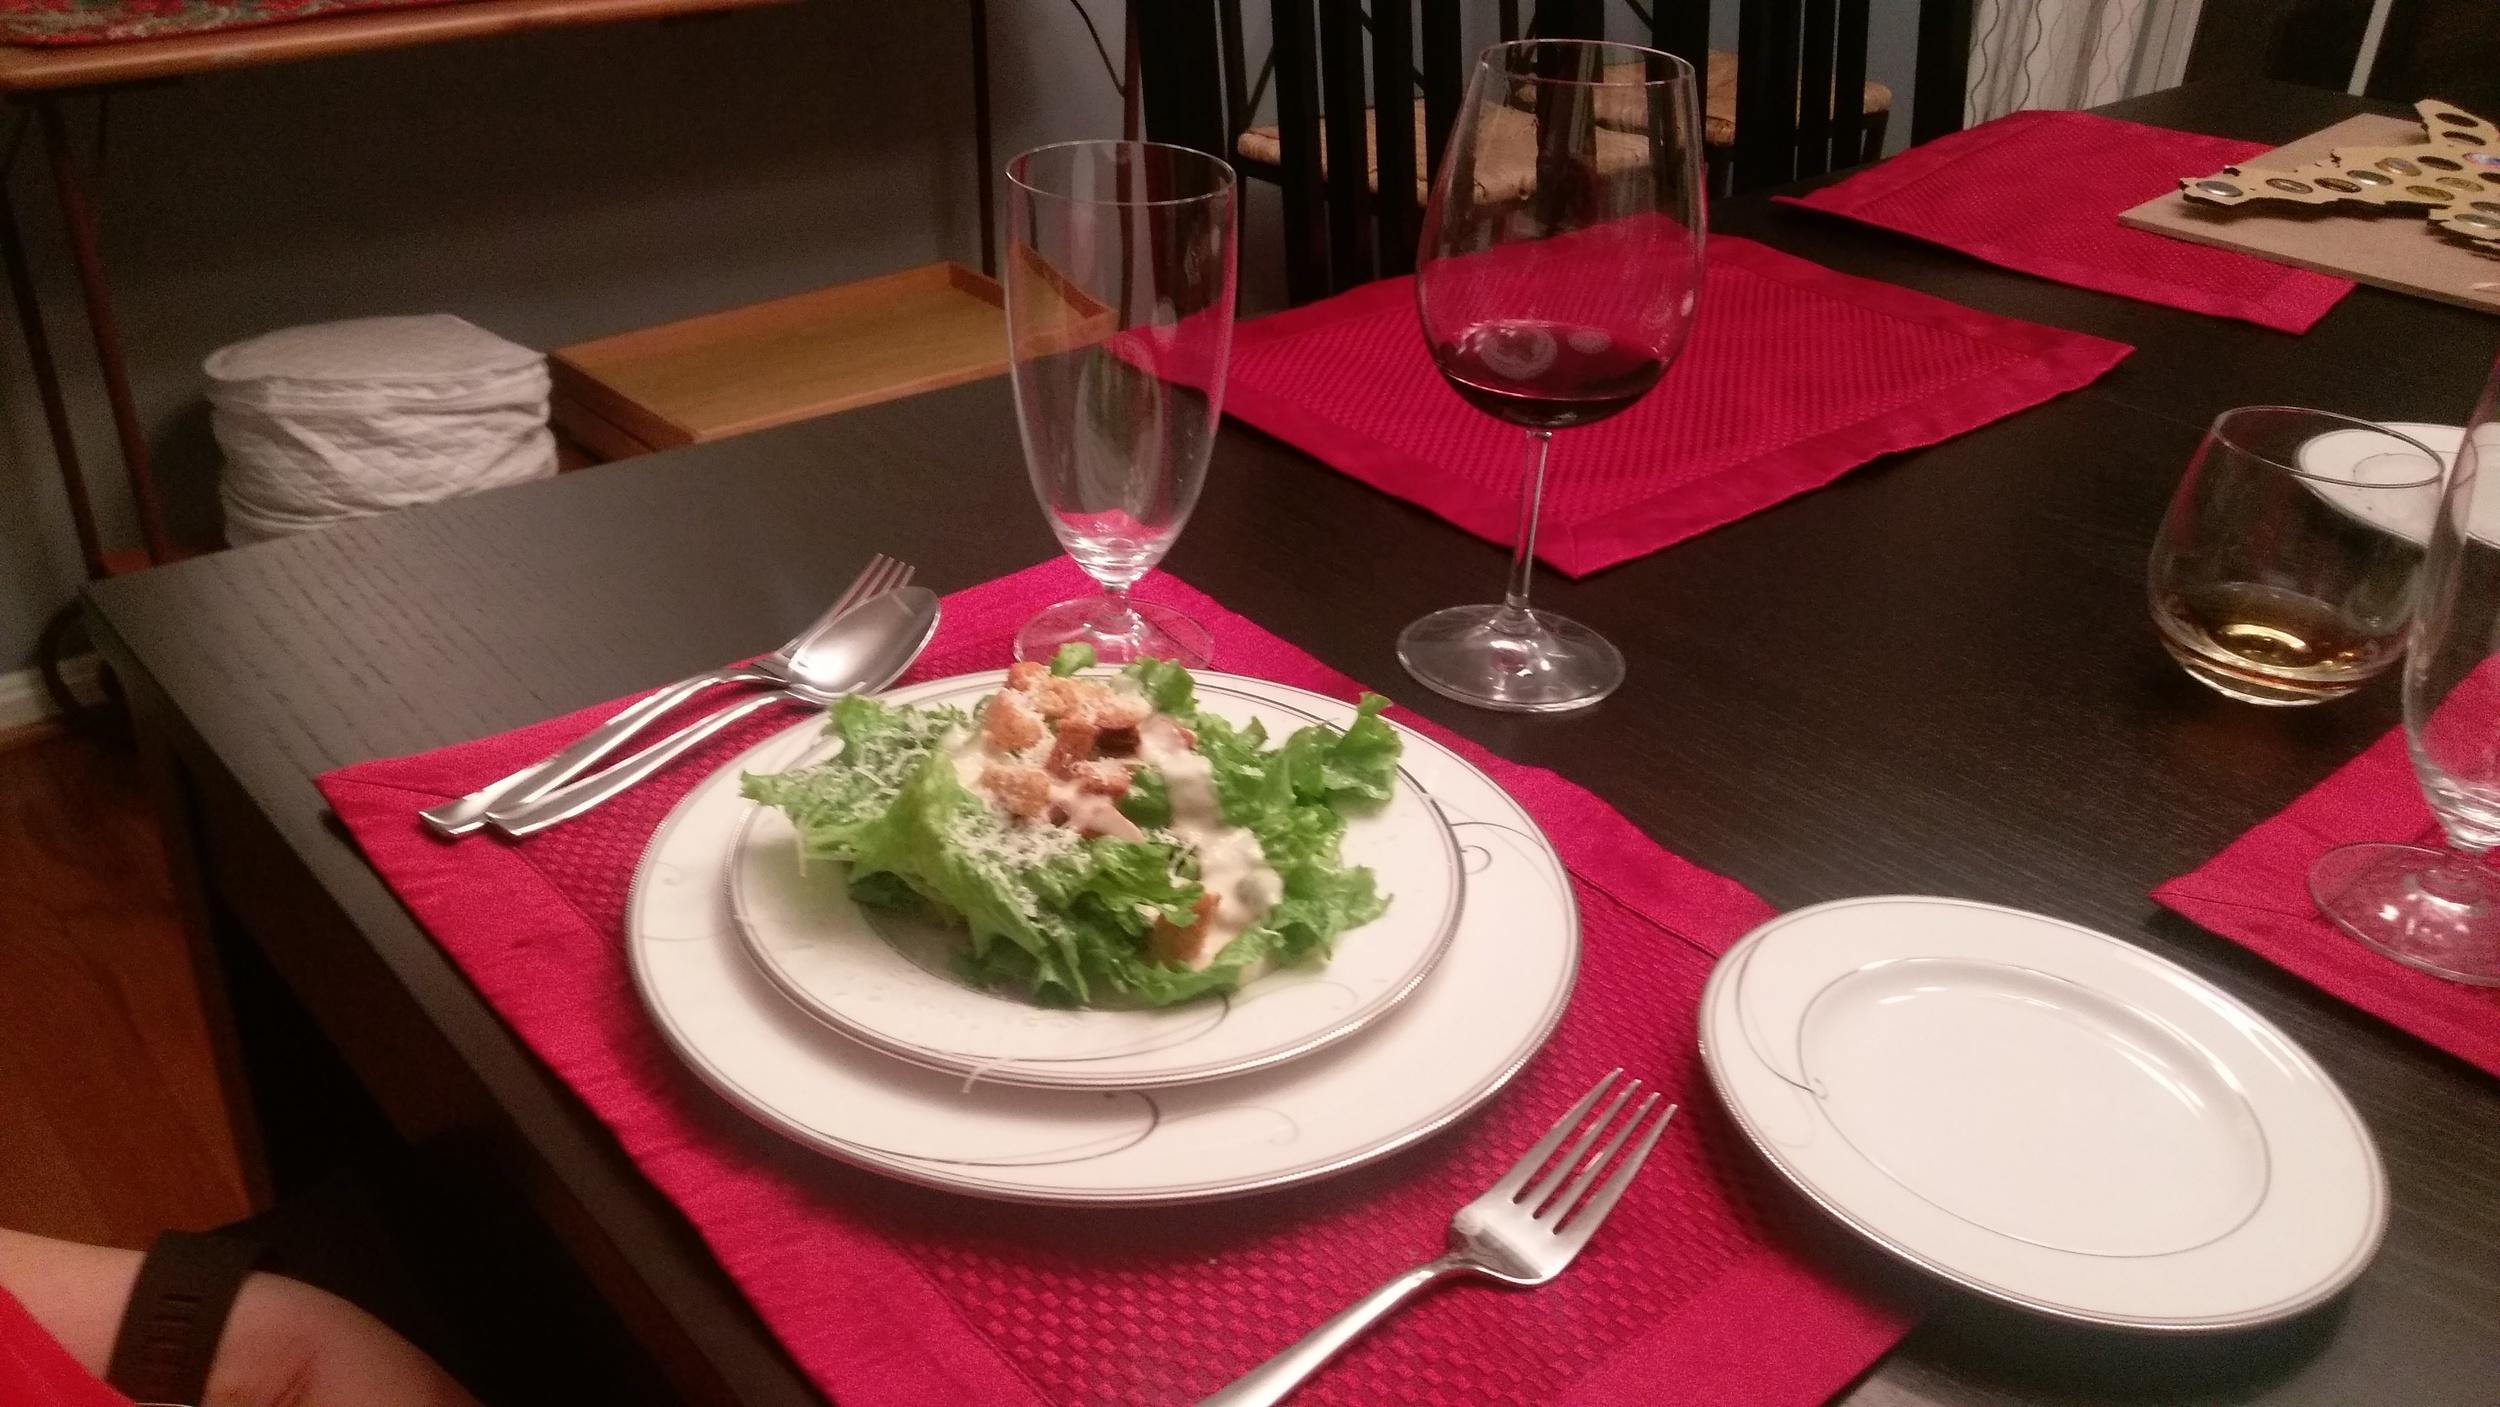 Caesar salad's are delicious.